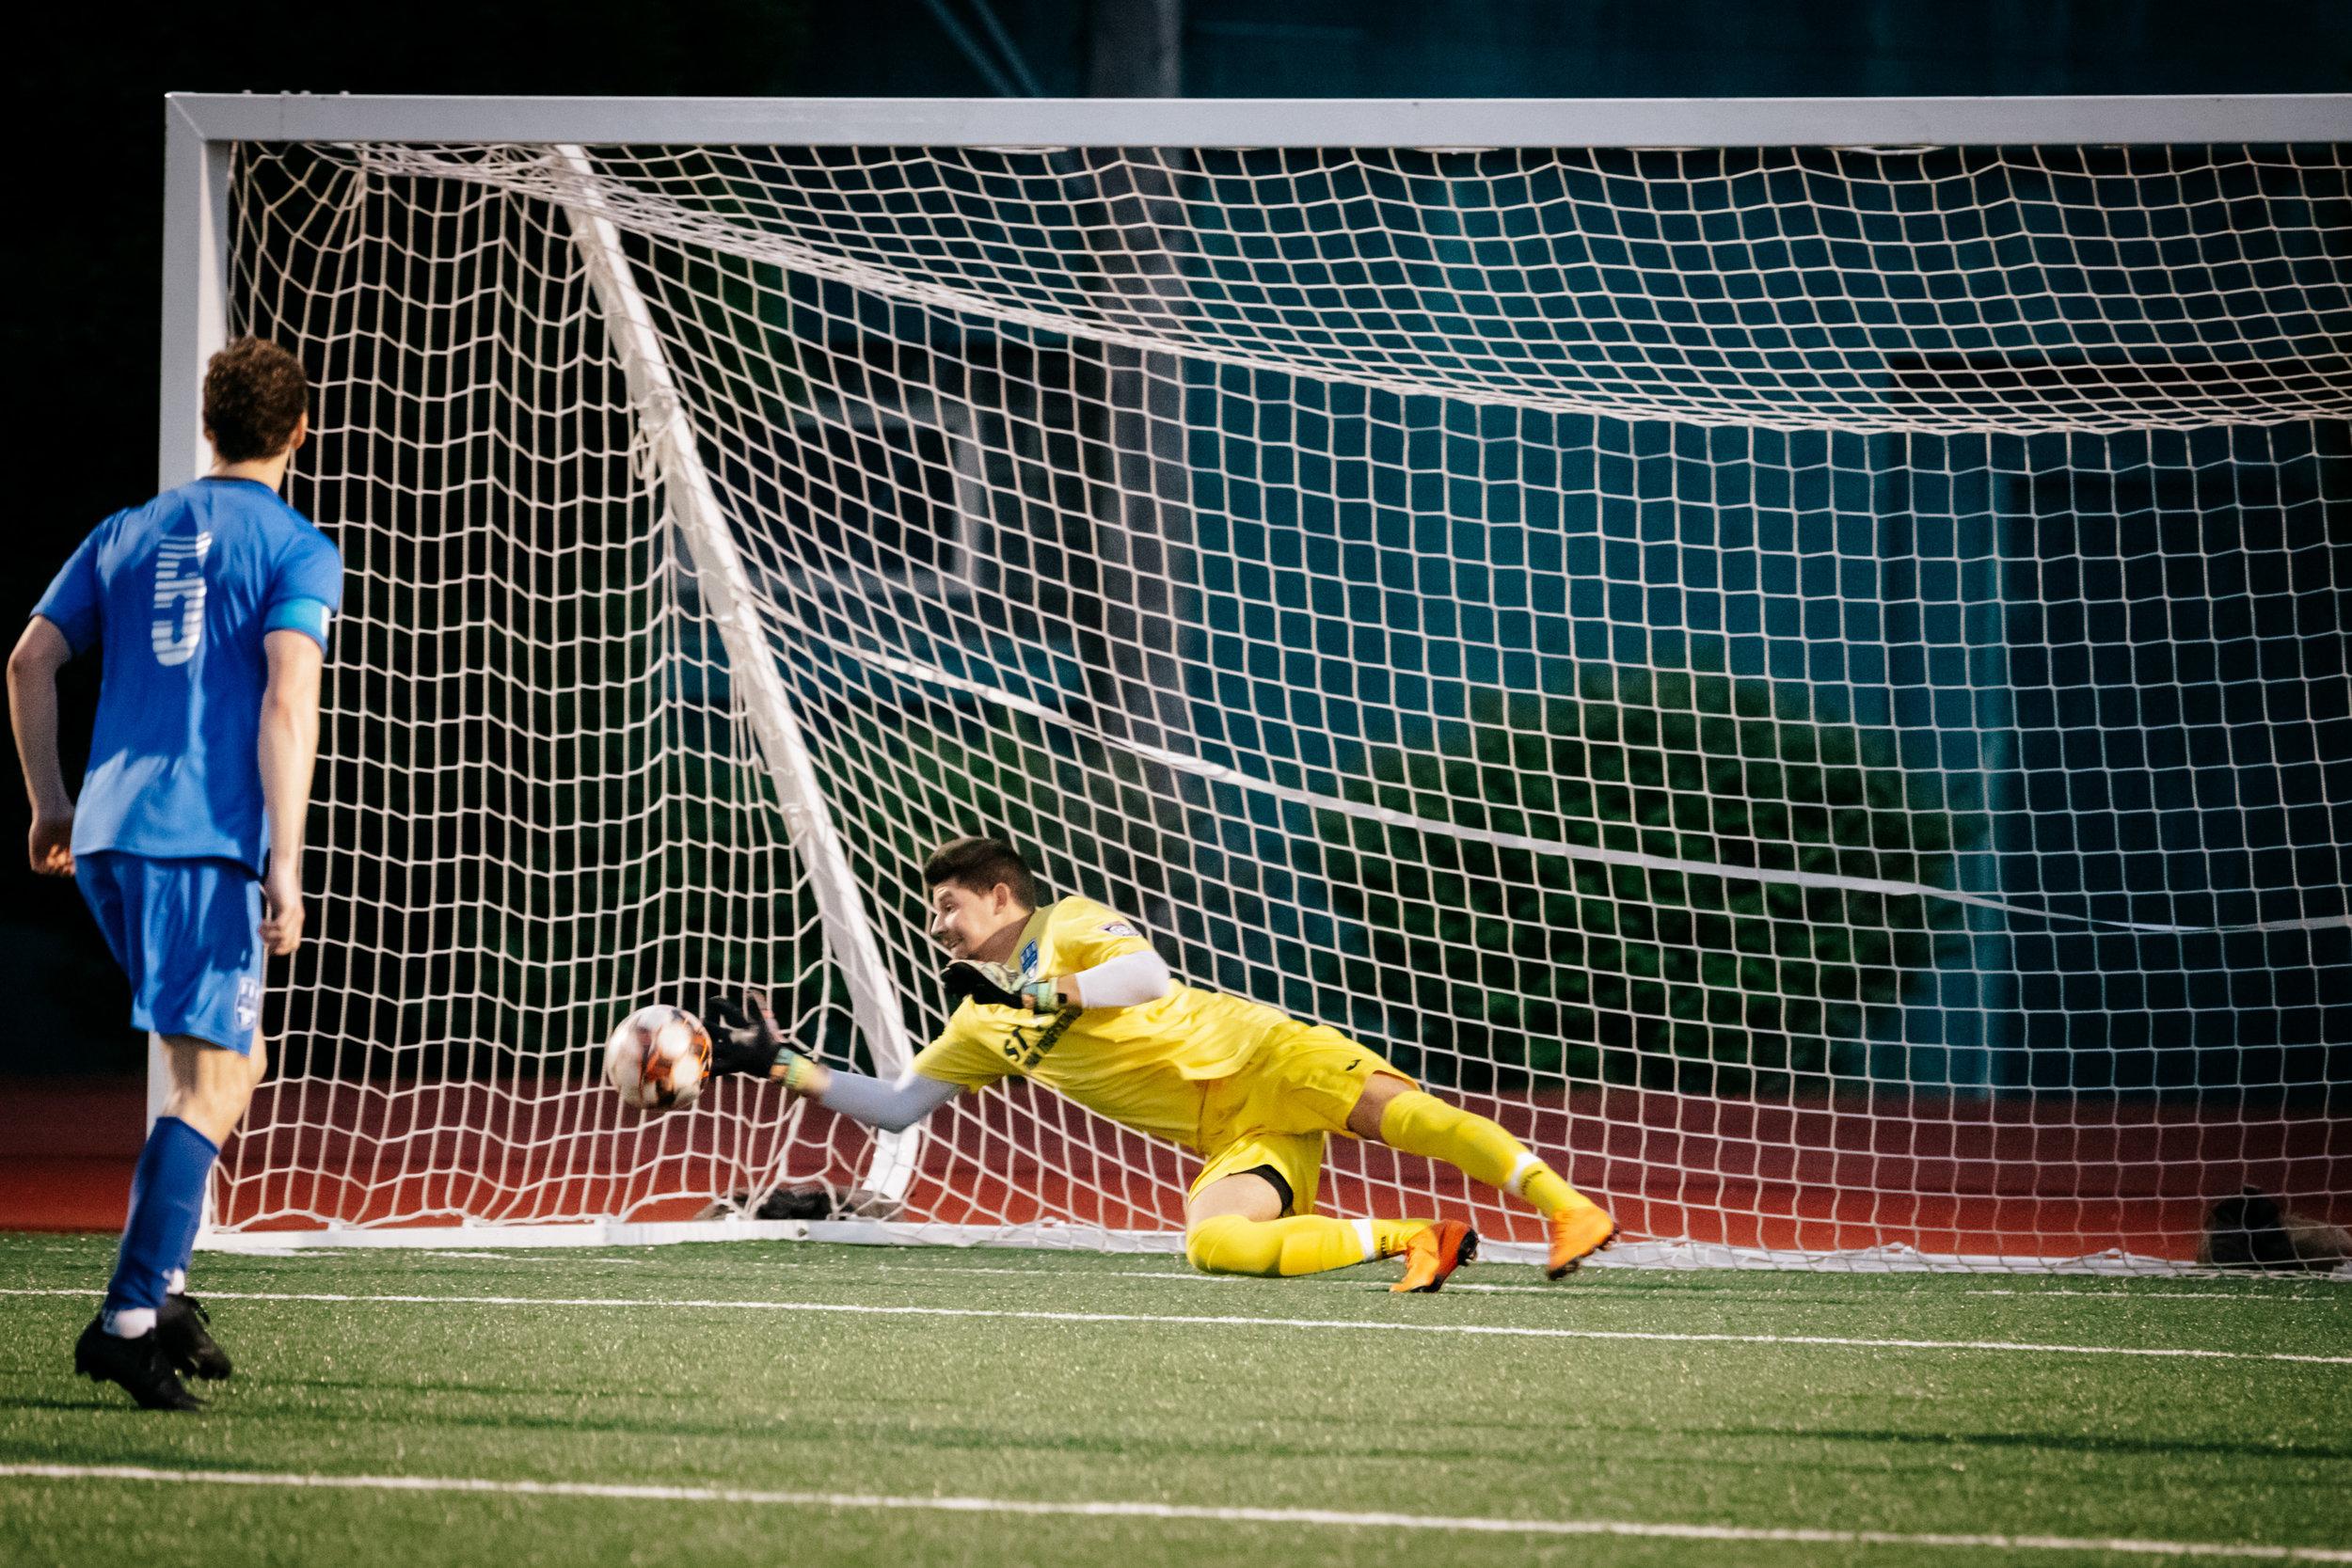 A big save from goalkeeper Nedin Kudic